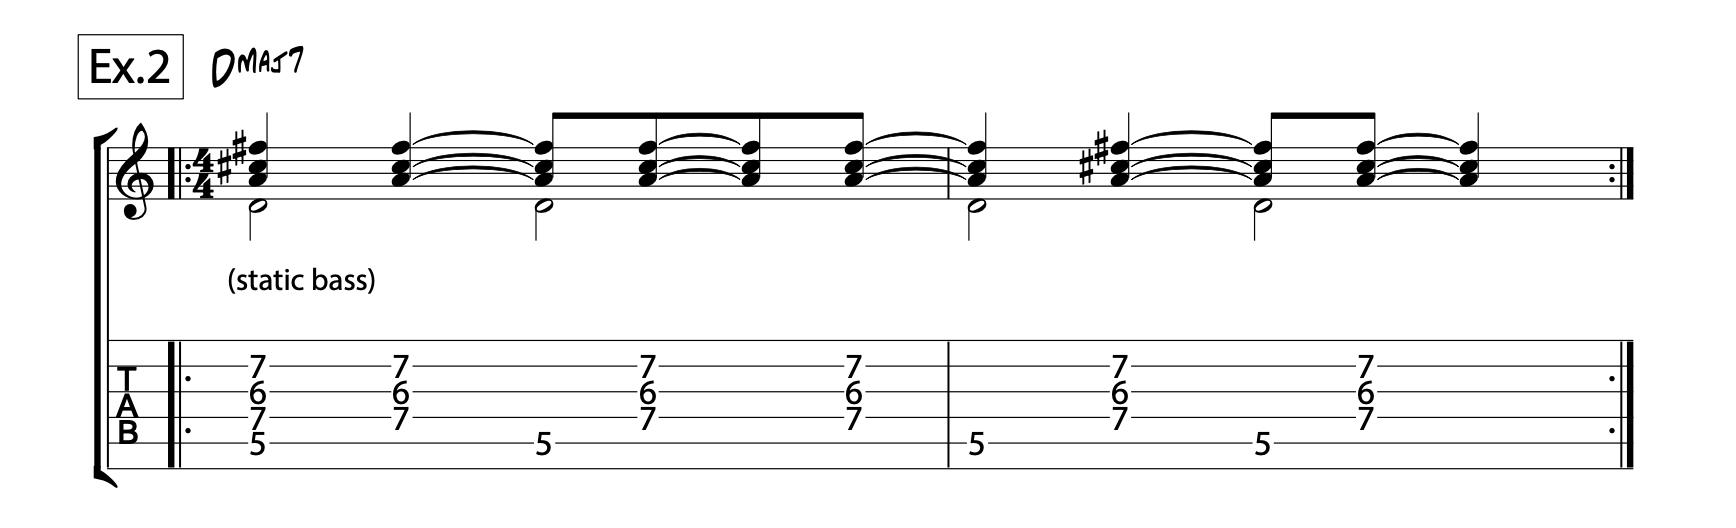 2-bossa-nova-guitar-tab